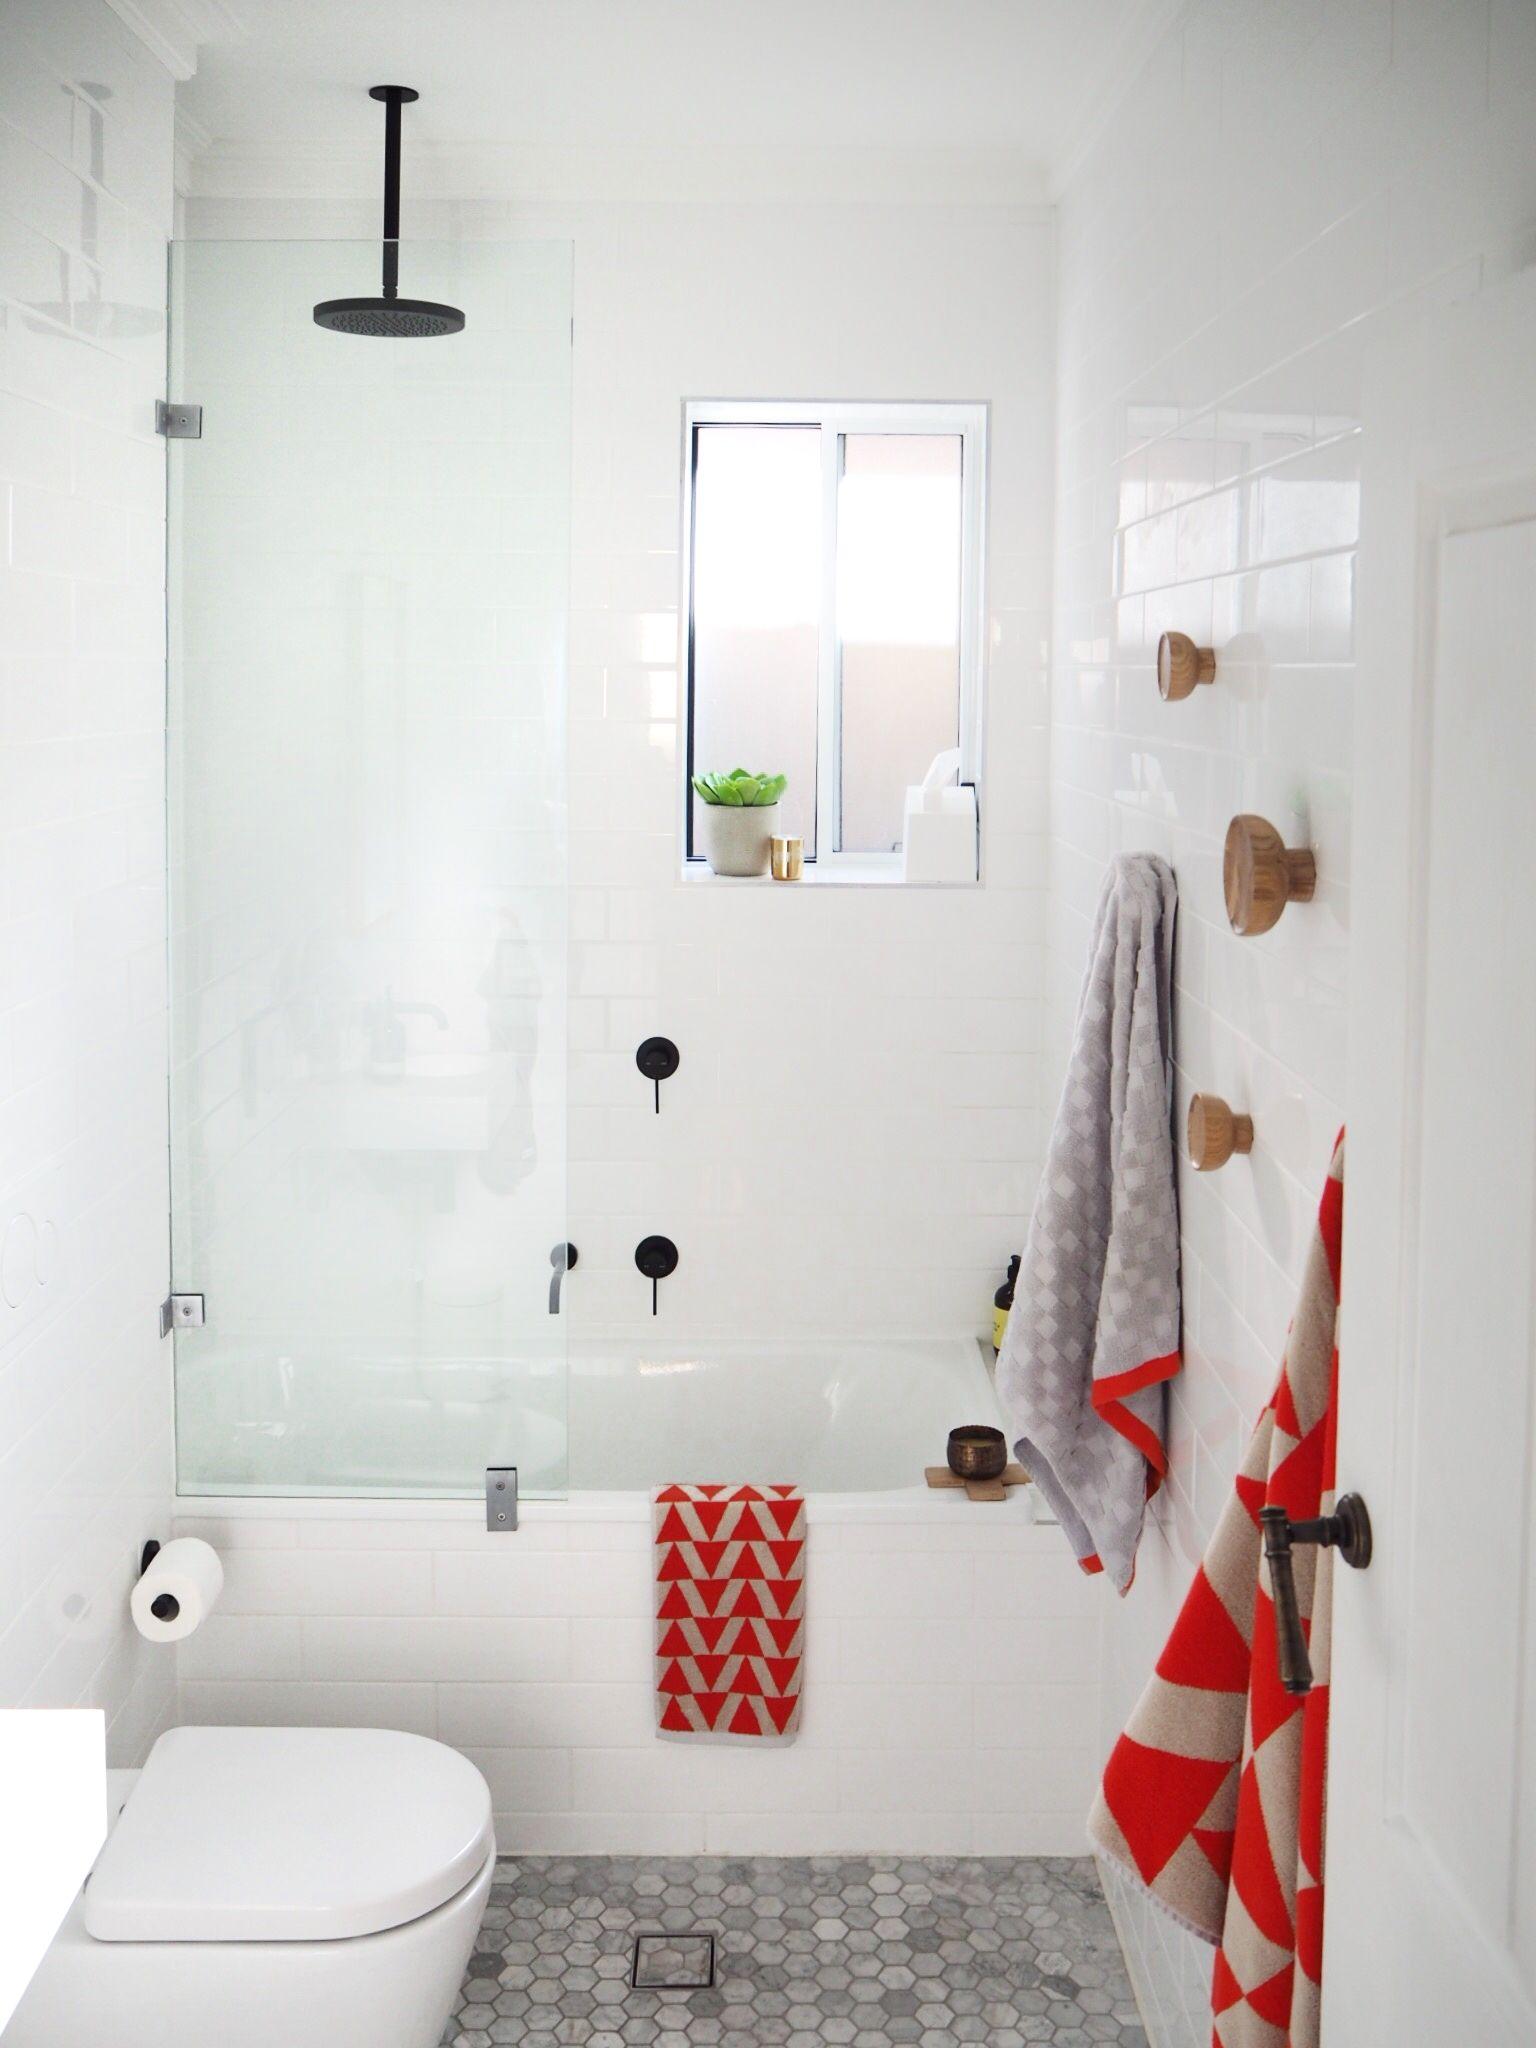 New Bathroom Renovation Adelaide Small Bathroom Renovations Bathroom Renovations Bathroom Renovation